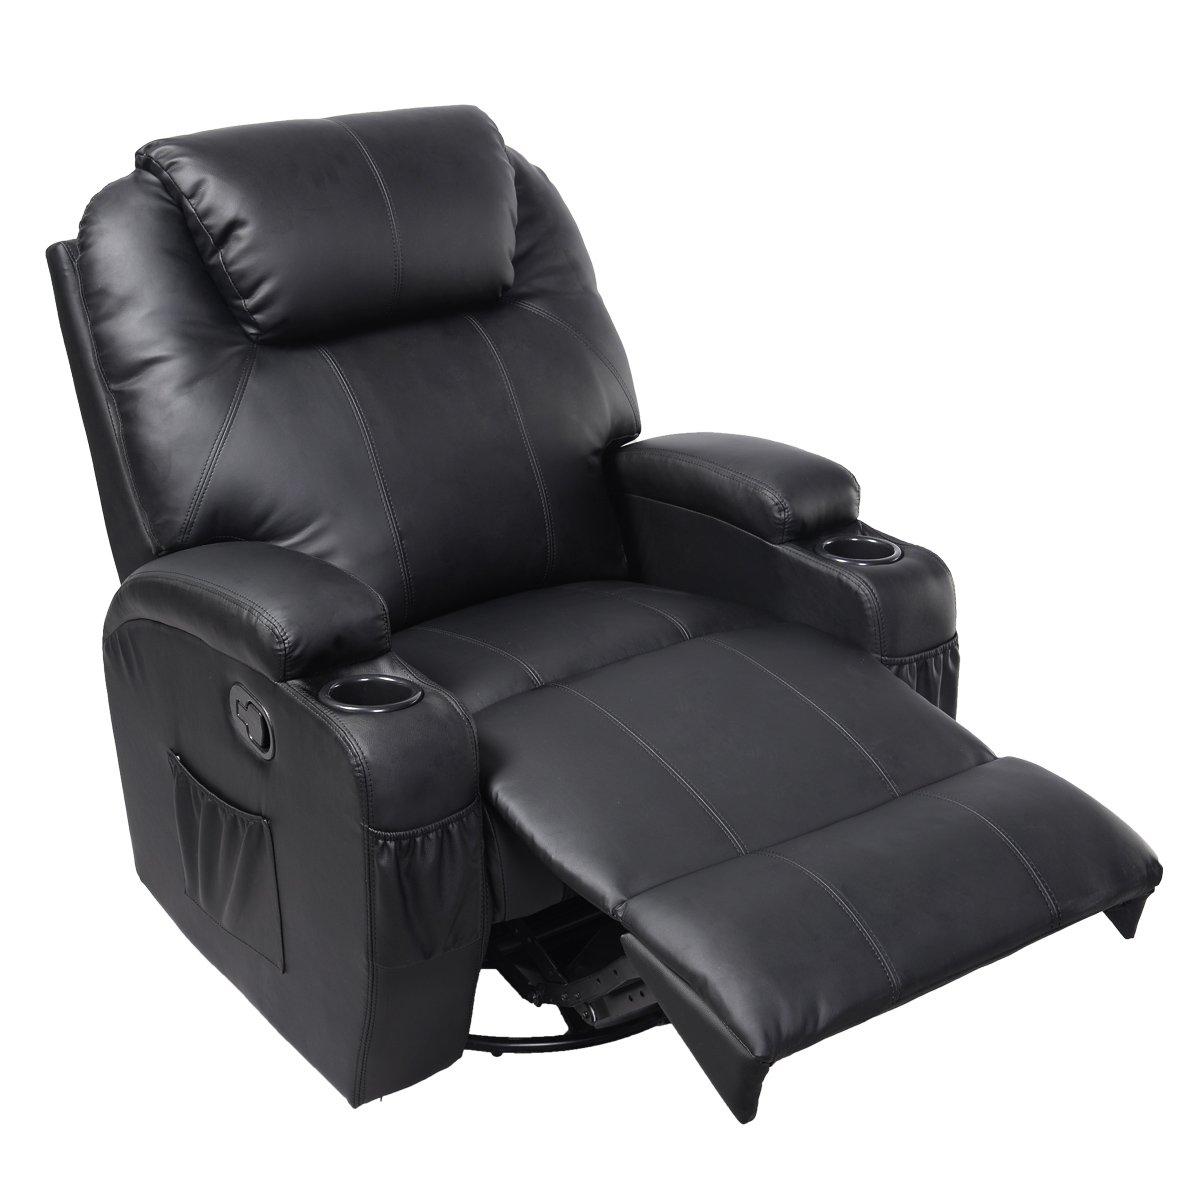 Amazon.com: Giantex Ergonomic Deluxe Massage Recliner Sofa ...